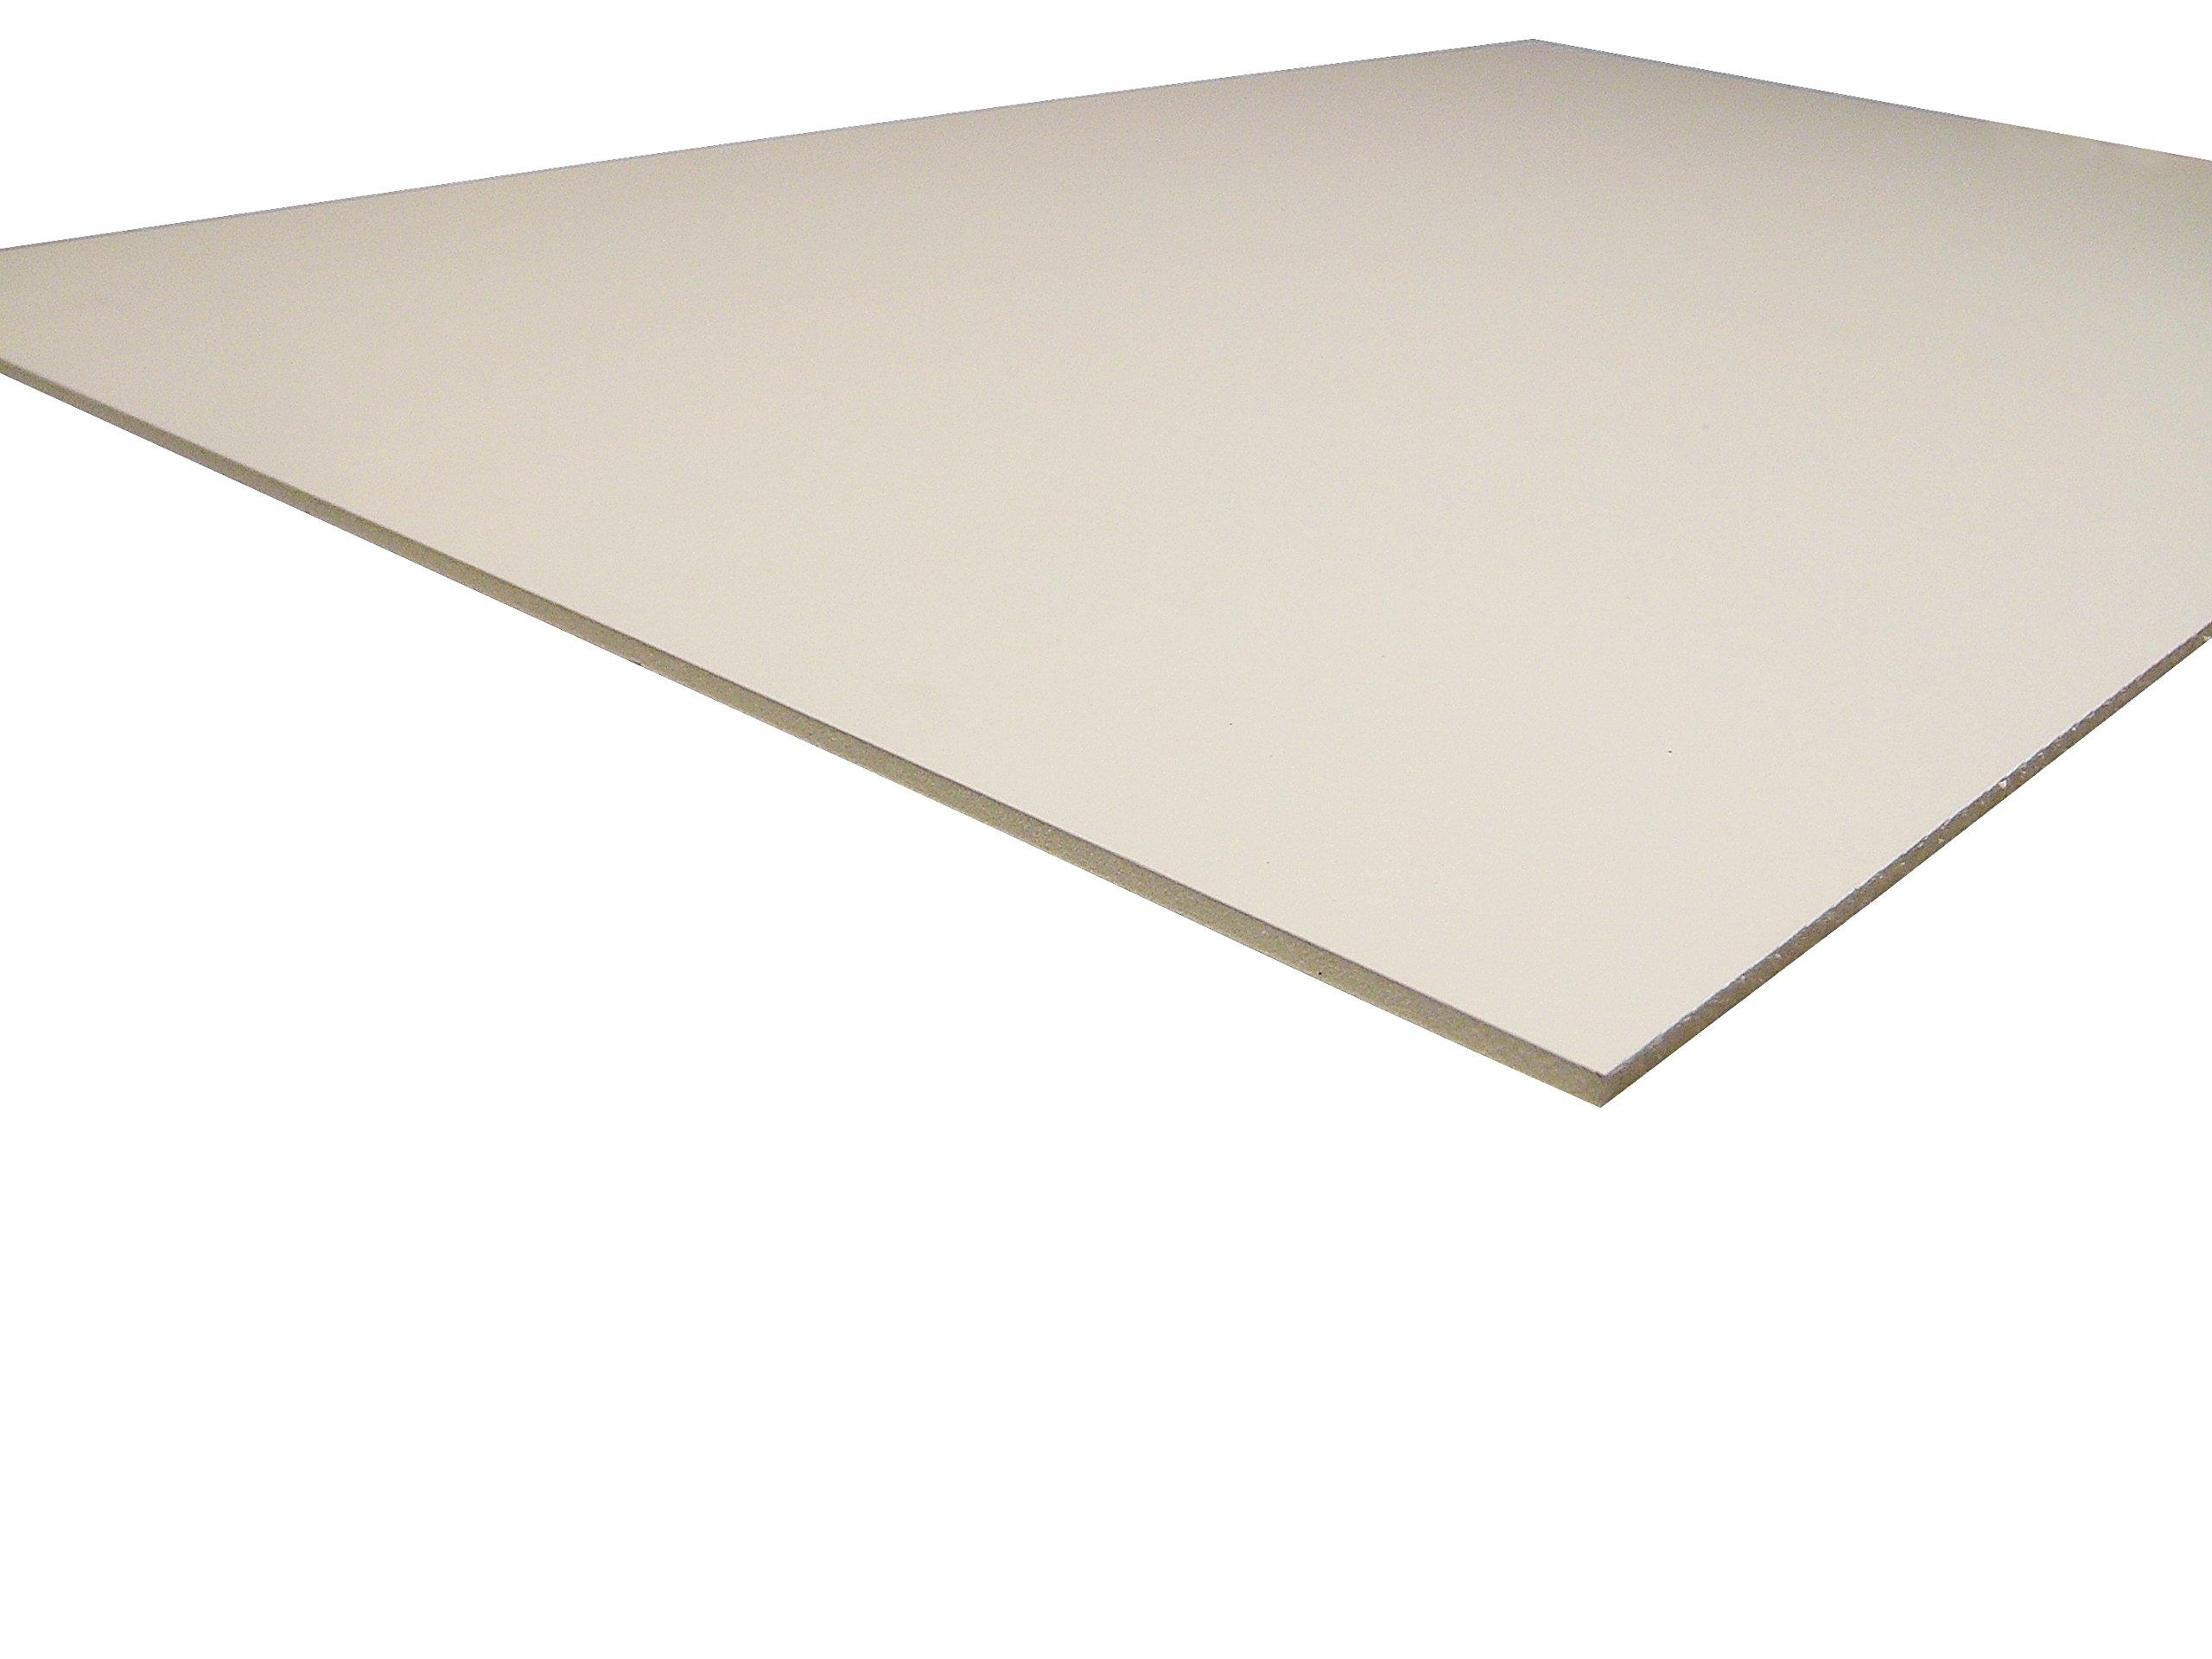 Gator Board - White 13''x19'' (10)